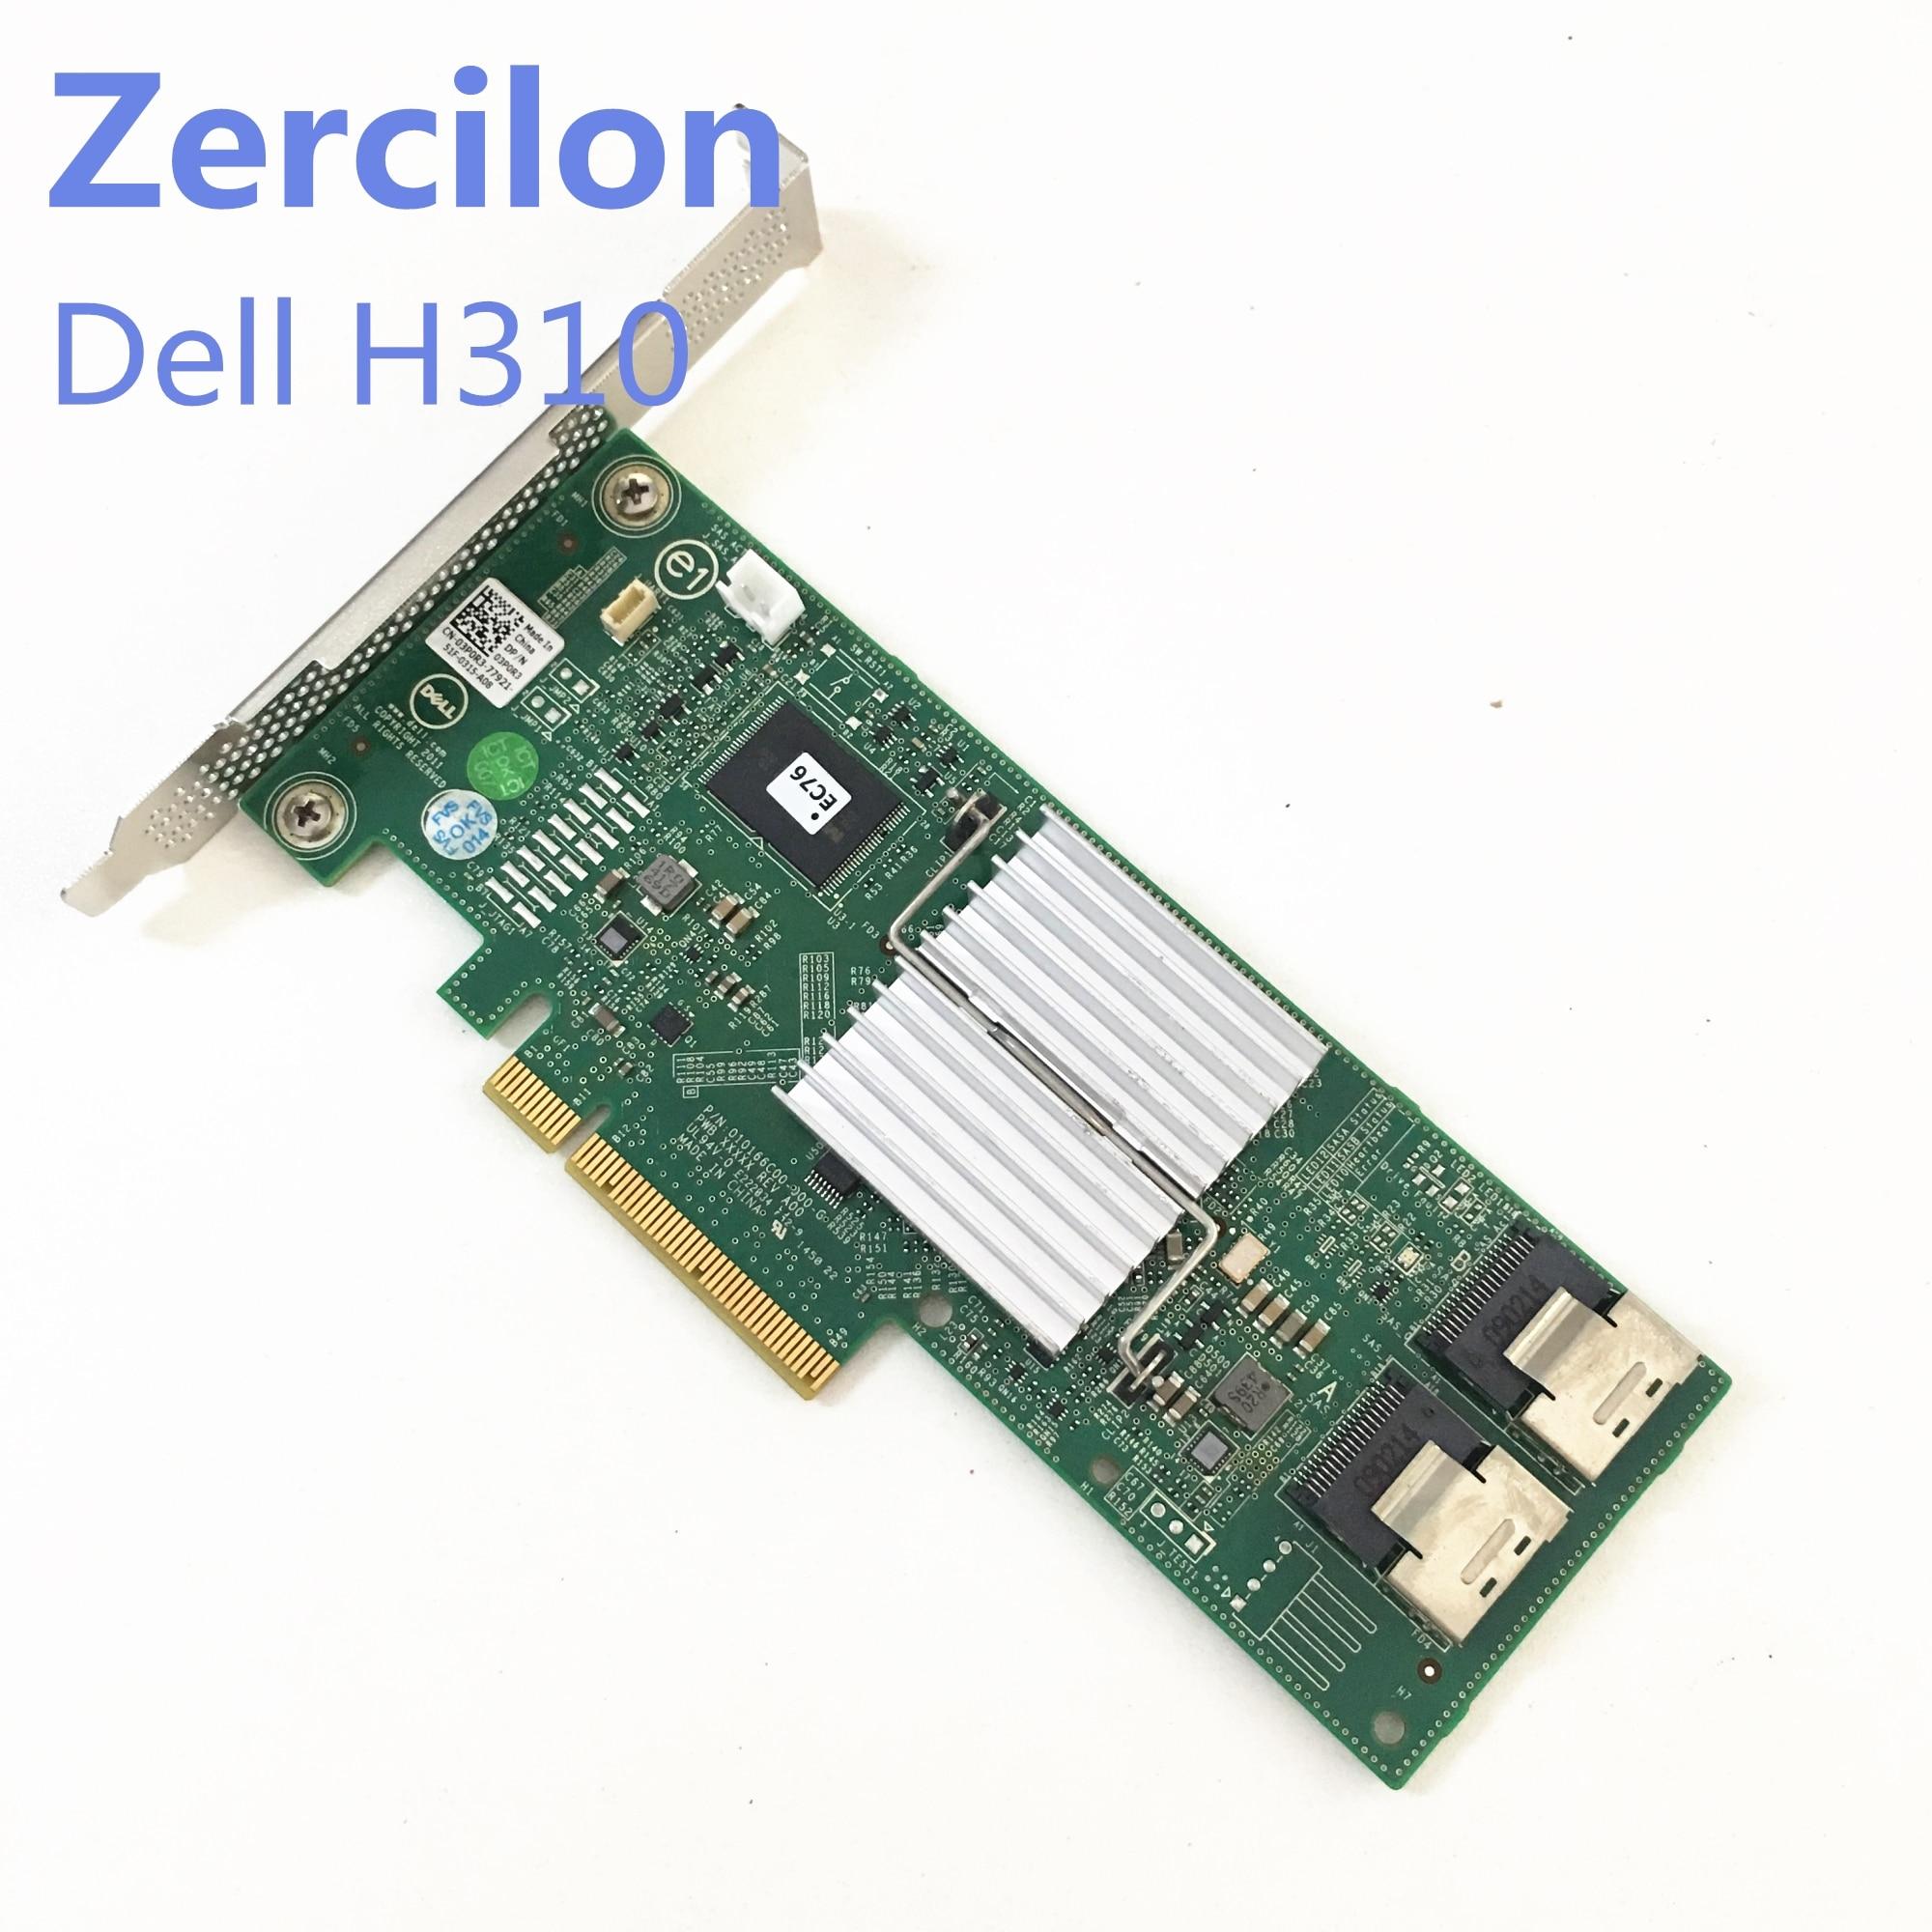 Used Original Dell Perc H310 SATA / SAS HBA Controller RAID 6Gbps PCIe X8 LSI 9240-8i M1015